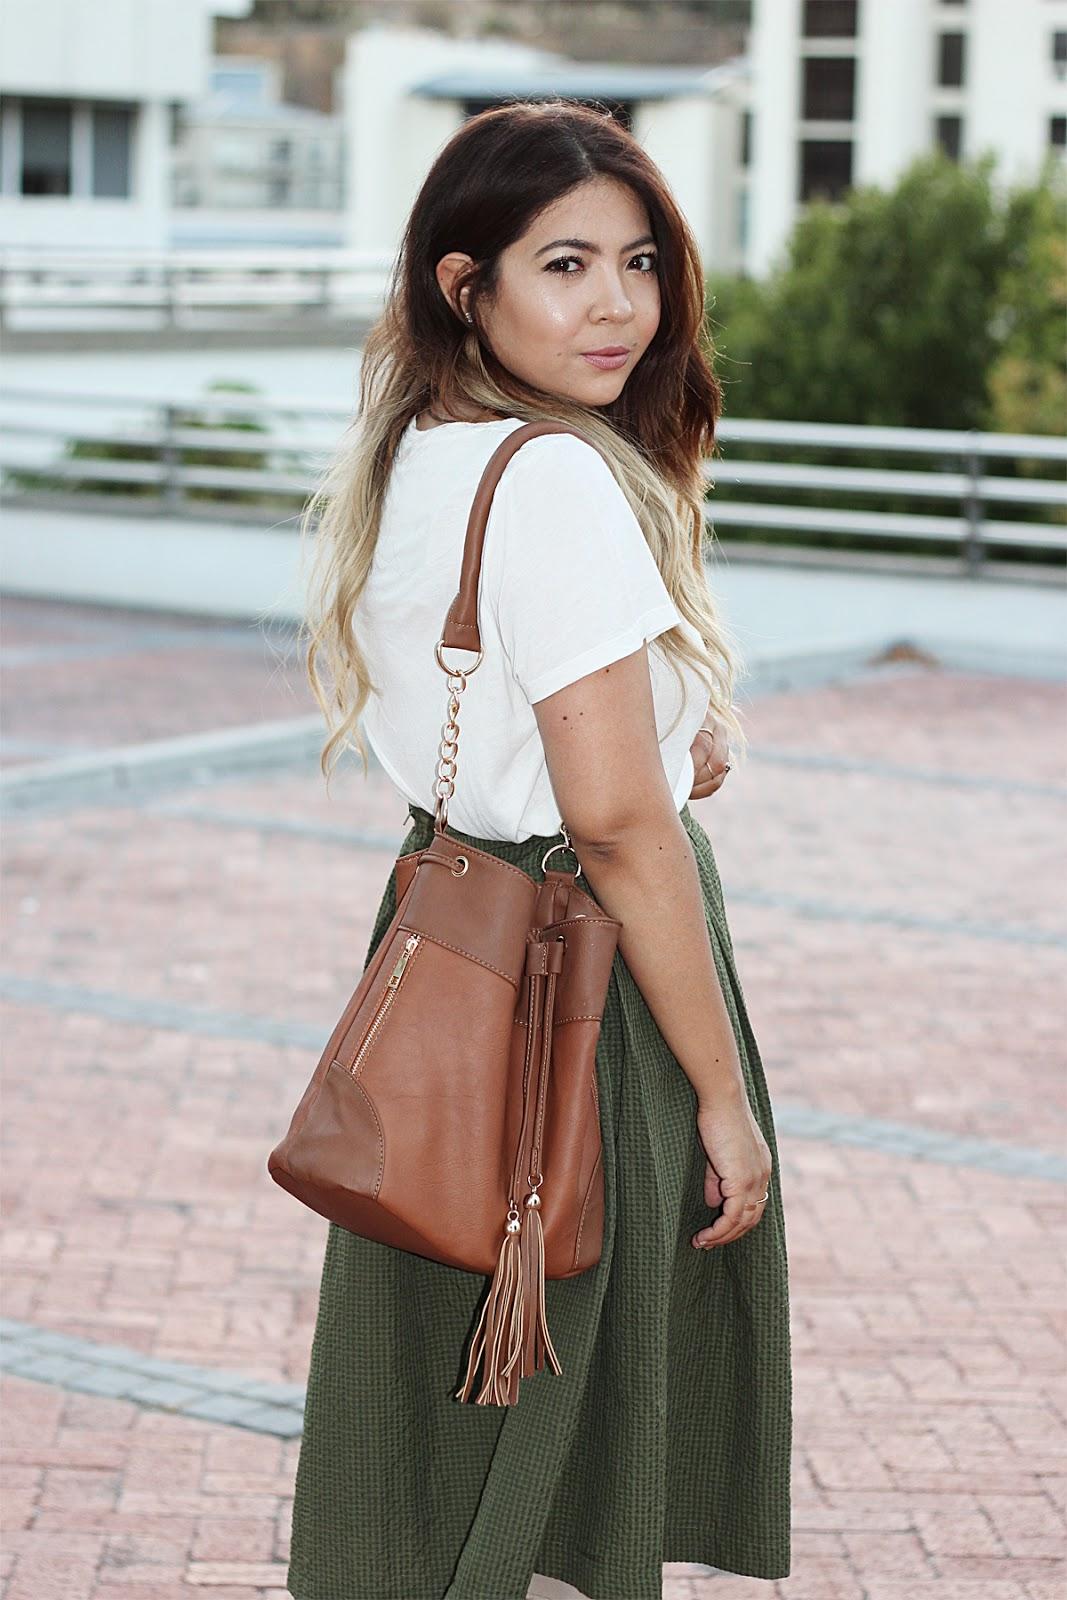 olive green midi skirt, mr price midi skirt, topshop t shirt, bucket bag, fashion blogger cape town, nude strappy heels